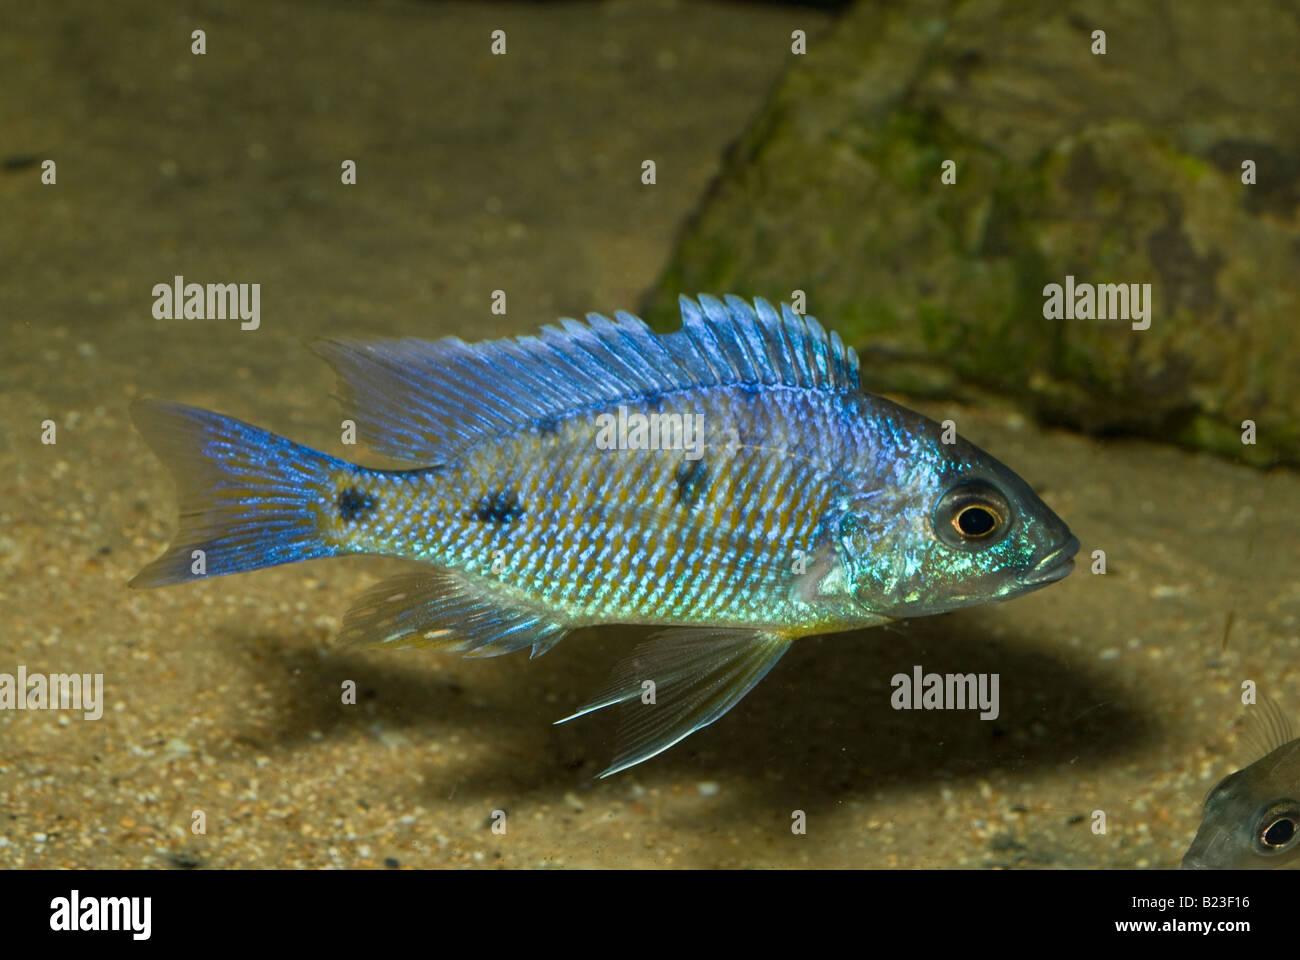 Fish for vertical aquarium - Copadichromis Azureus Mbenji Malawi Lake Cichlid Africa Fish Fishes Aquarium Aquaria Vertical Freshwater Roberto Nistri